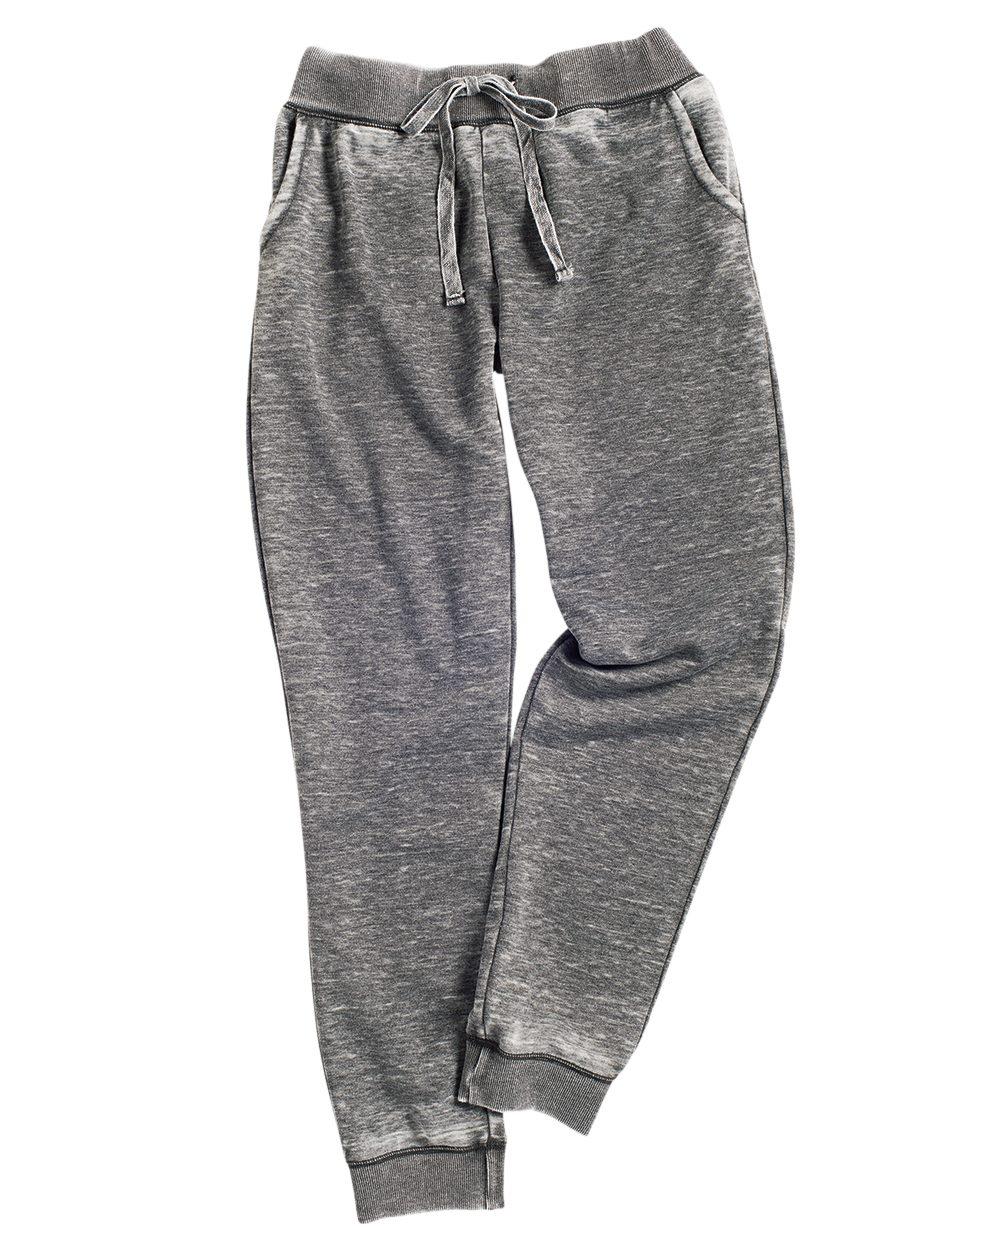 Best Jogger Pants - J. America